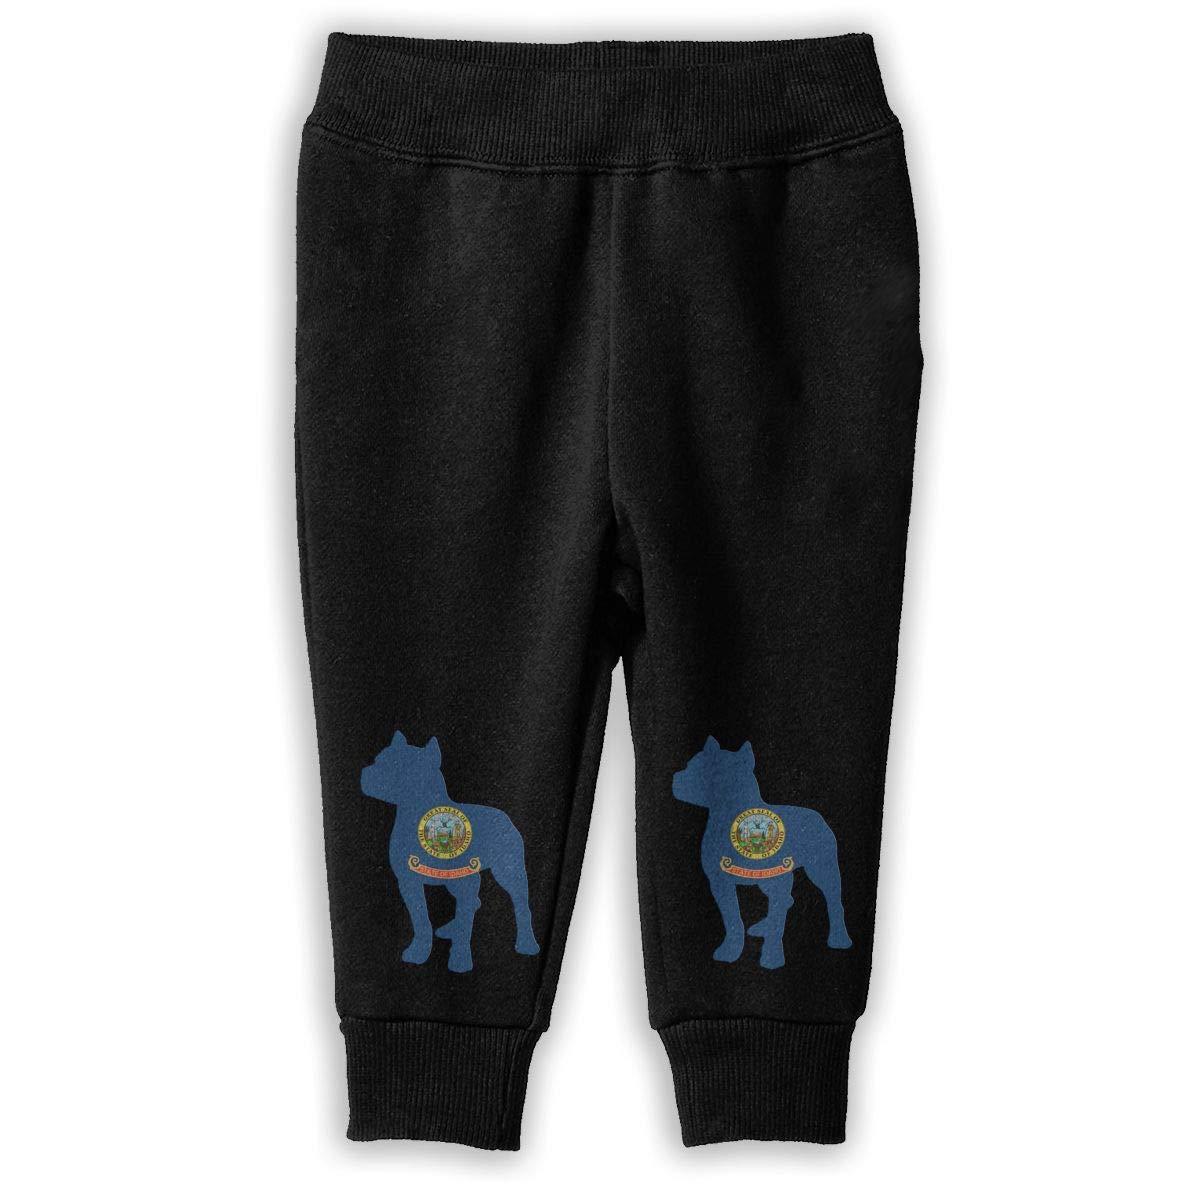 NJKM5MJ Patriotic Pitbull Idaho State Flag Sweatpants Little Girls Jogger Fleece Pants